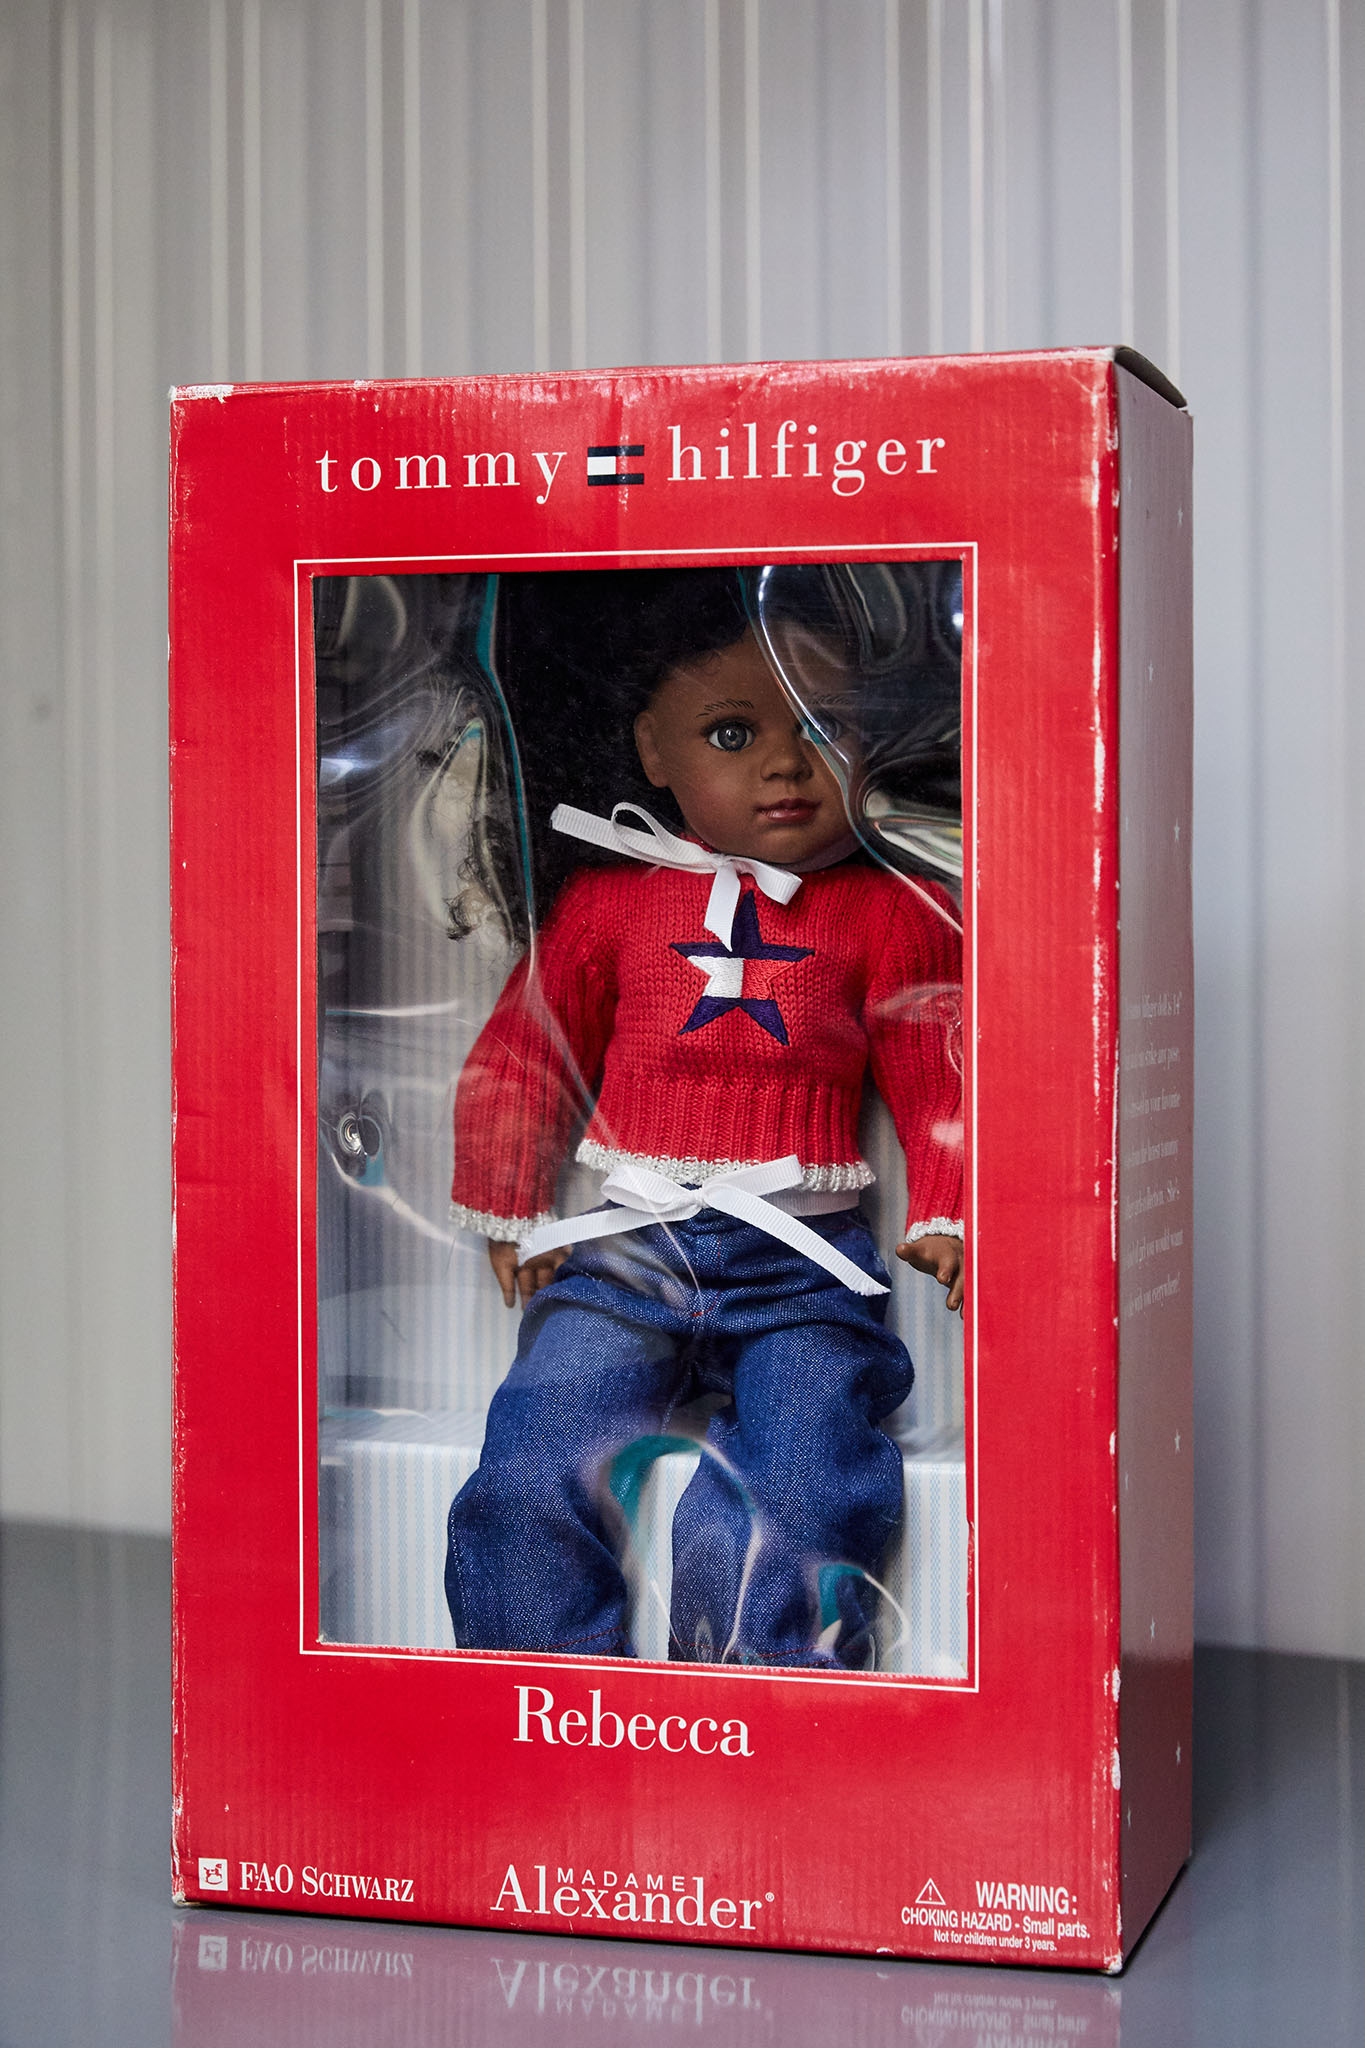 Tommy Hilfiger Madame Alexander Rebecca Doll, 2000.